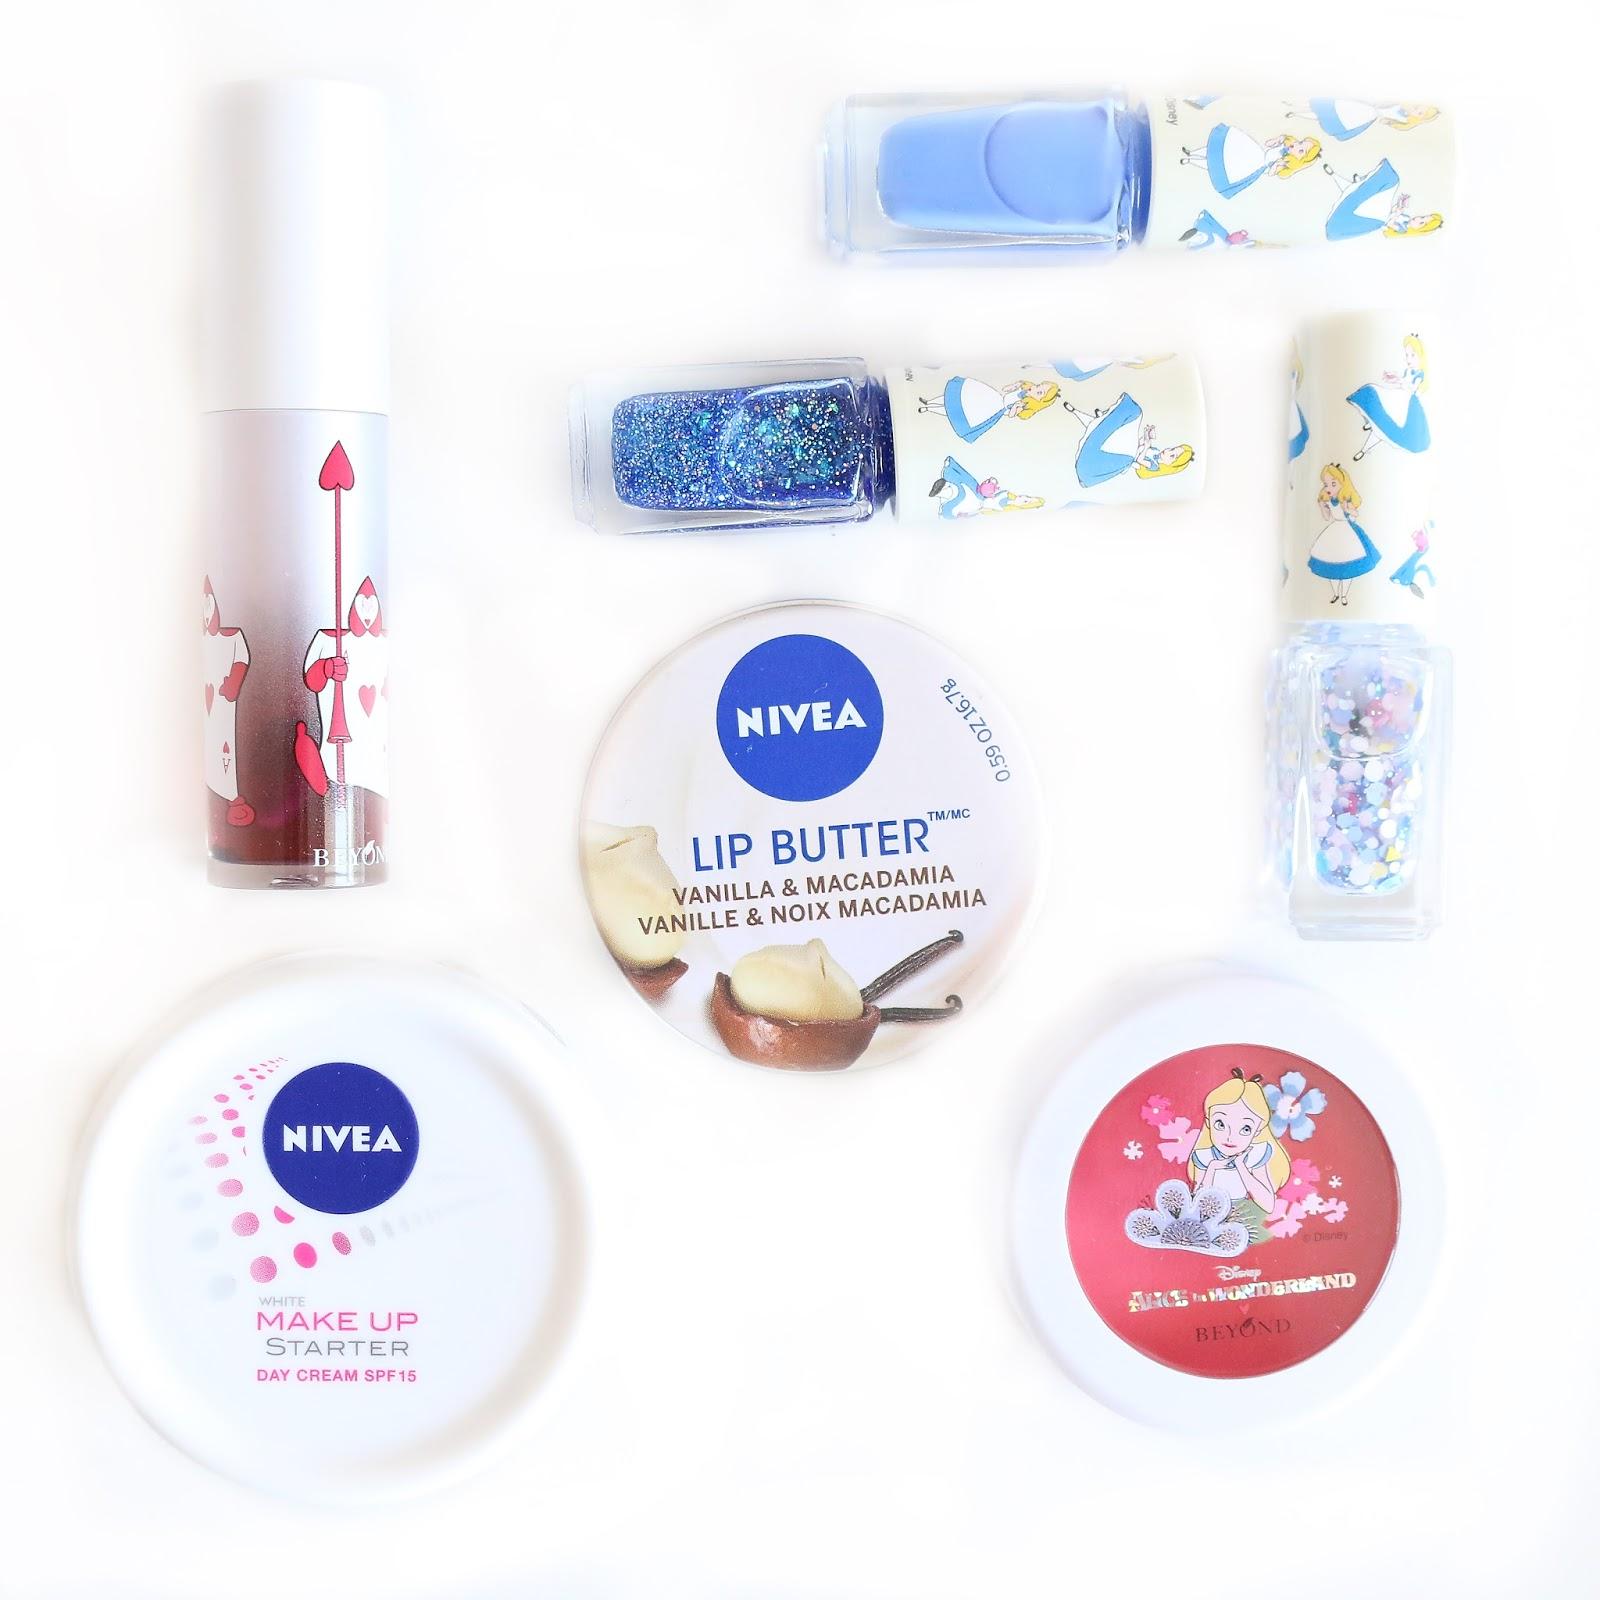 nivea, nivea indonesia, nivea white, nivea makeup, nivea makeup starter, nivea cream, moisturizer, nivea moisturizer, review nivea, makeup starter